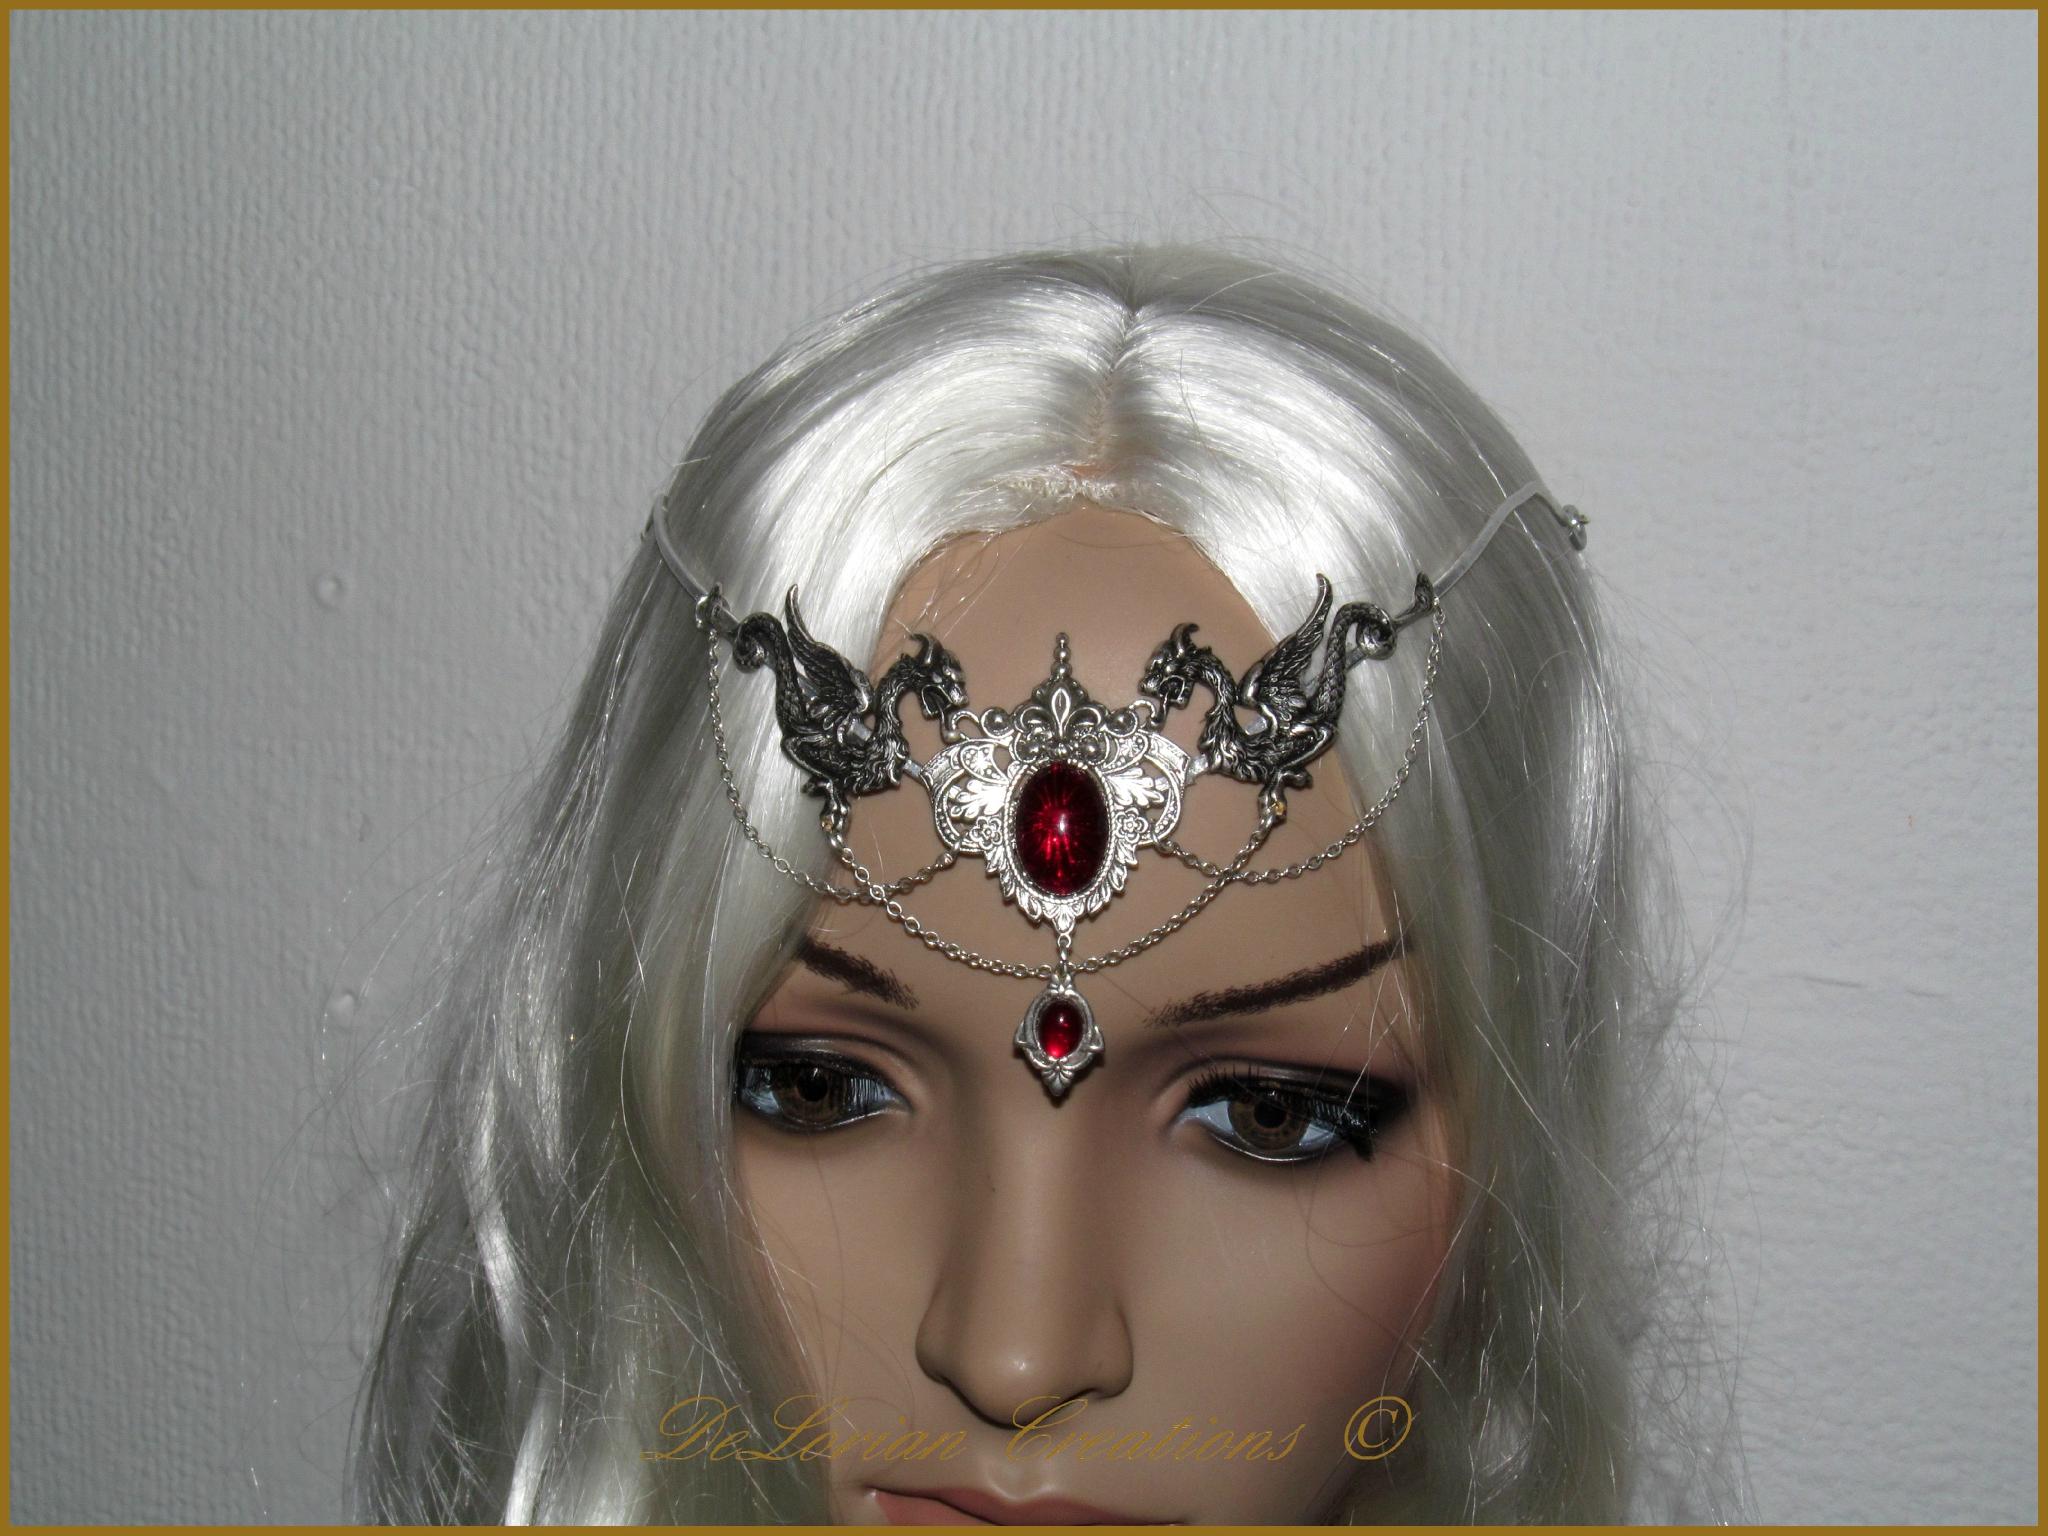 diad me daenerys bijou mariage dragon medieval heroic. Black Bedroom Furniture Sets. Home Design Ideas